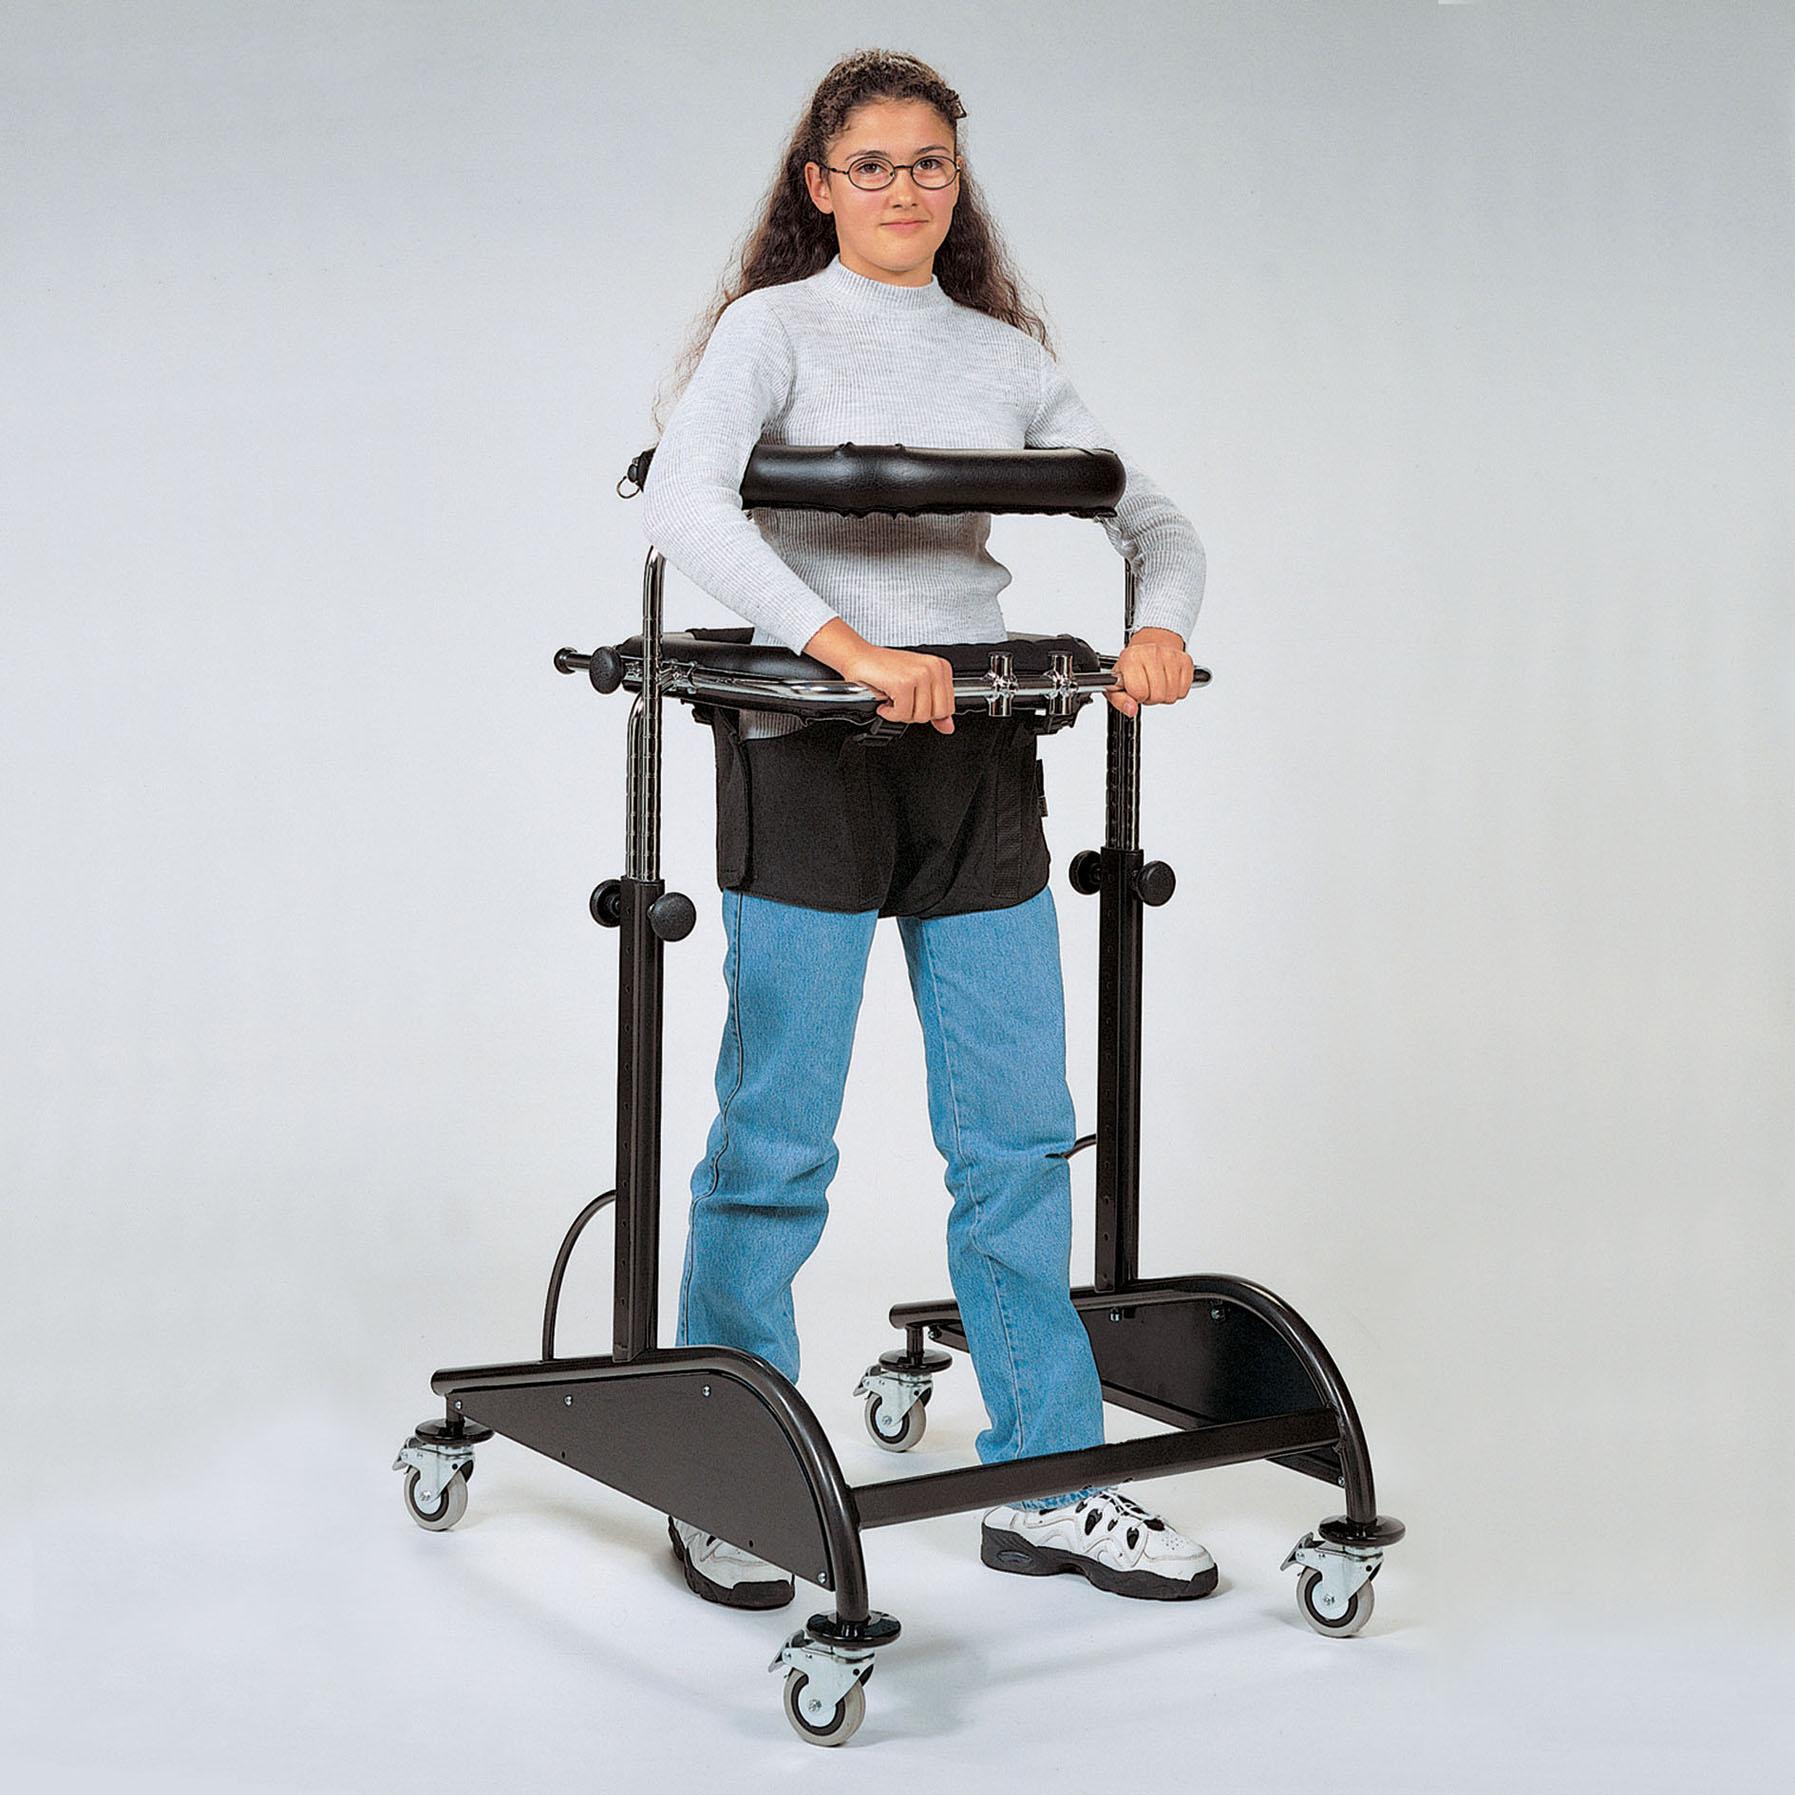 Ходунки для инвалидов Ormesa Dynamico (Динамико)